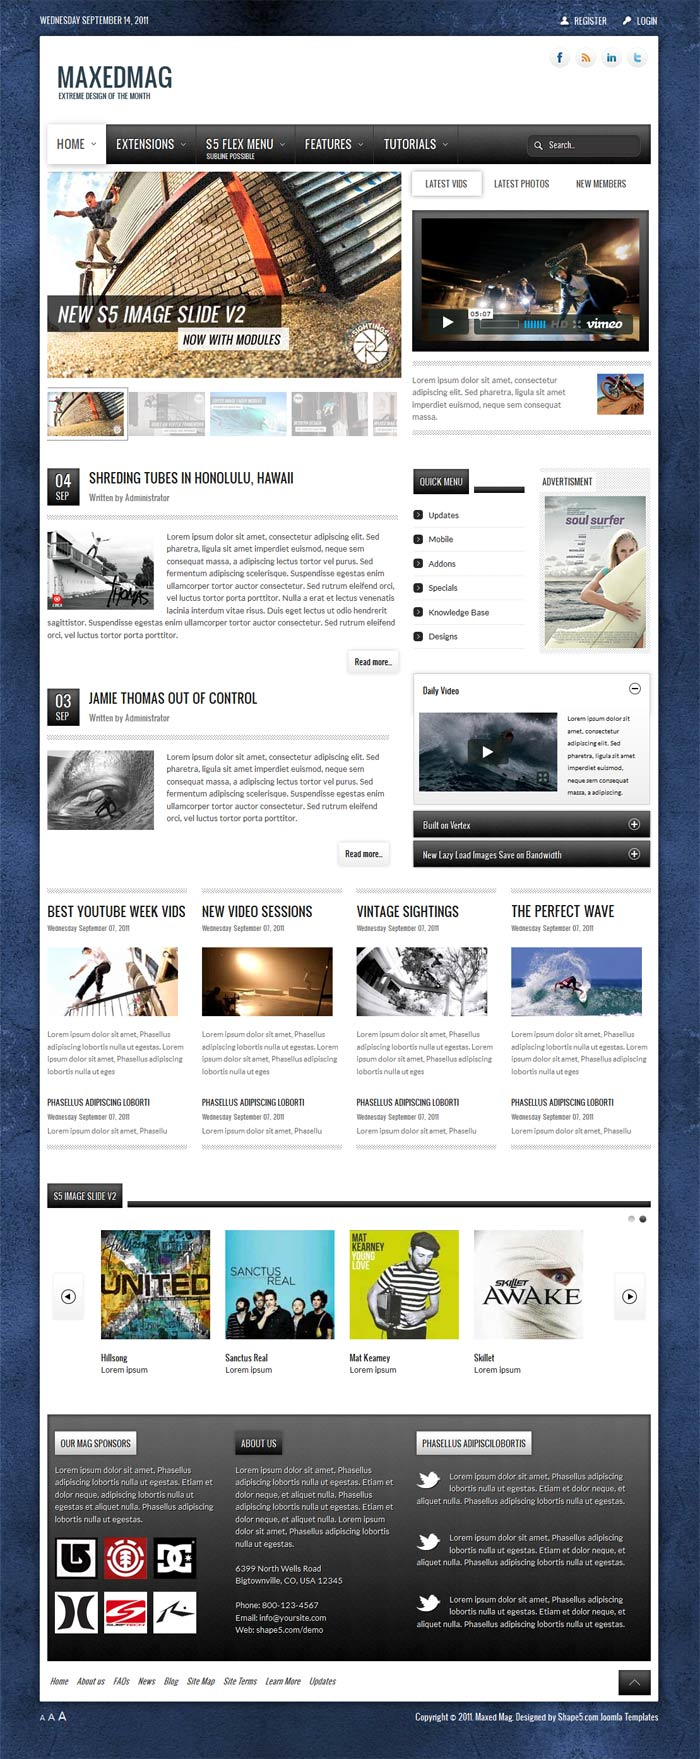 Shape5 Maxed Mag for Joomla 2.5 template